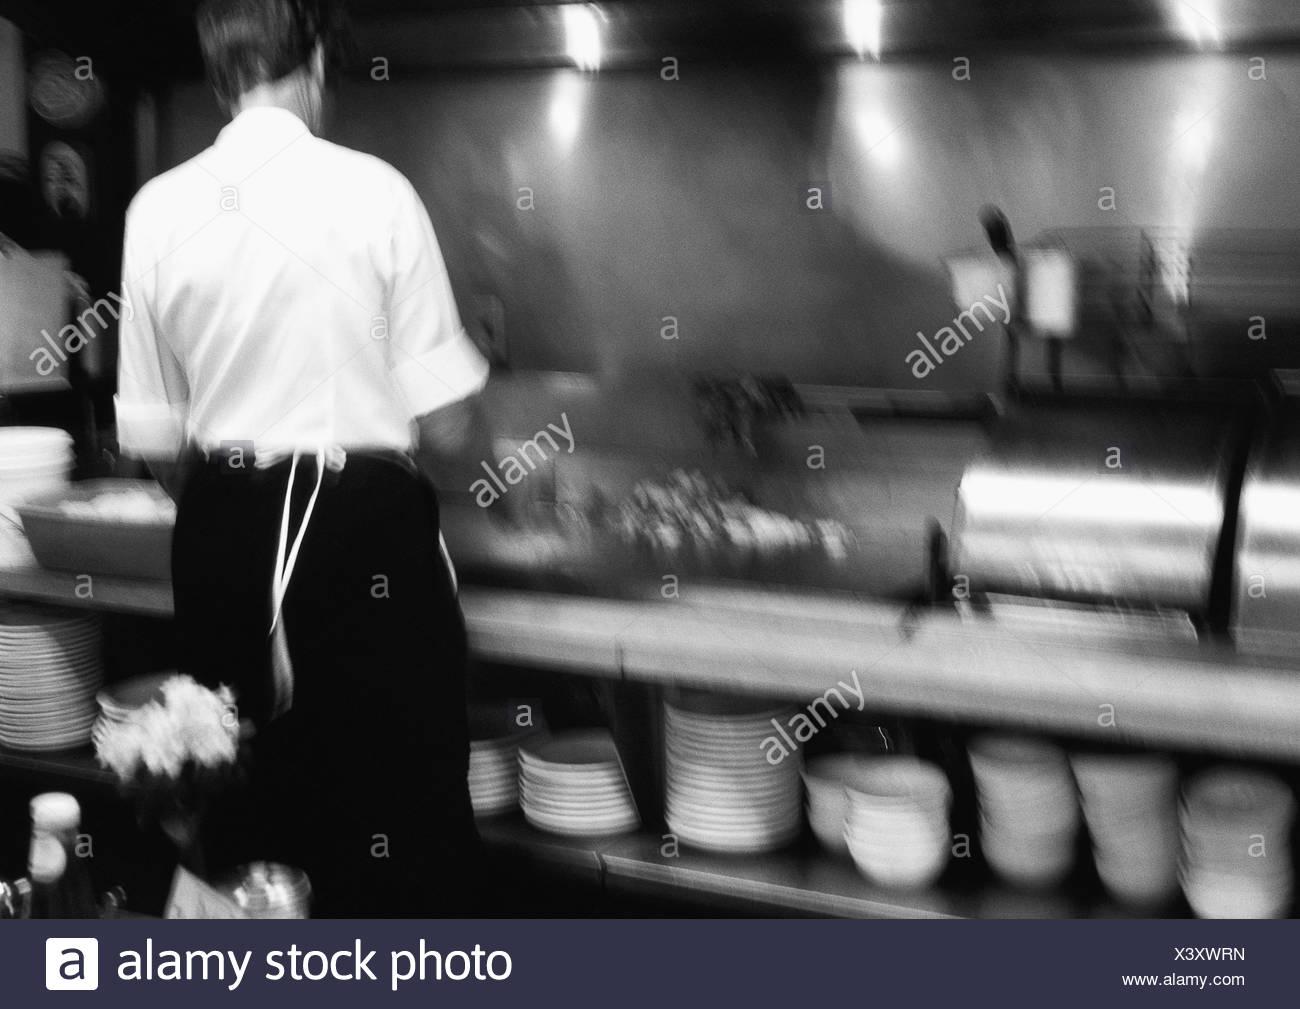 Short-order cook - Stock Image